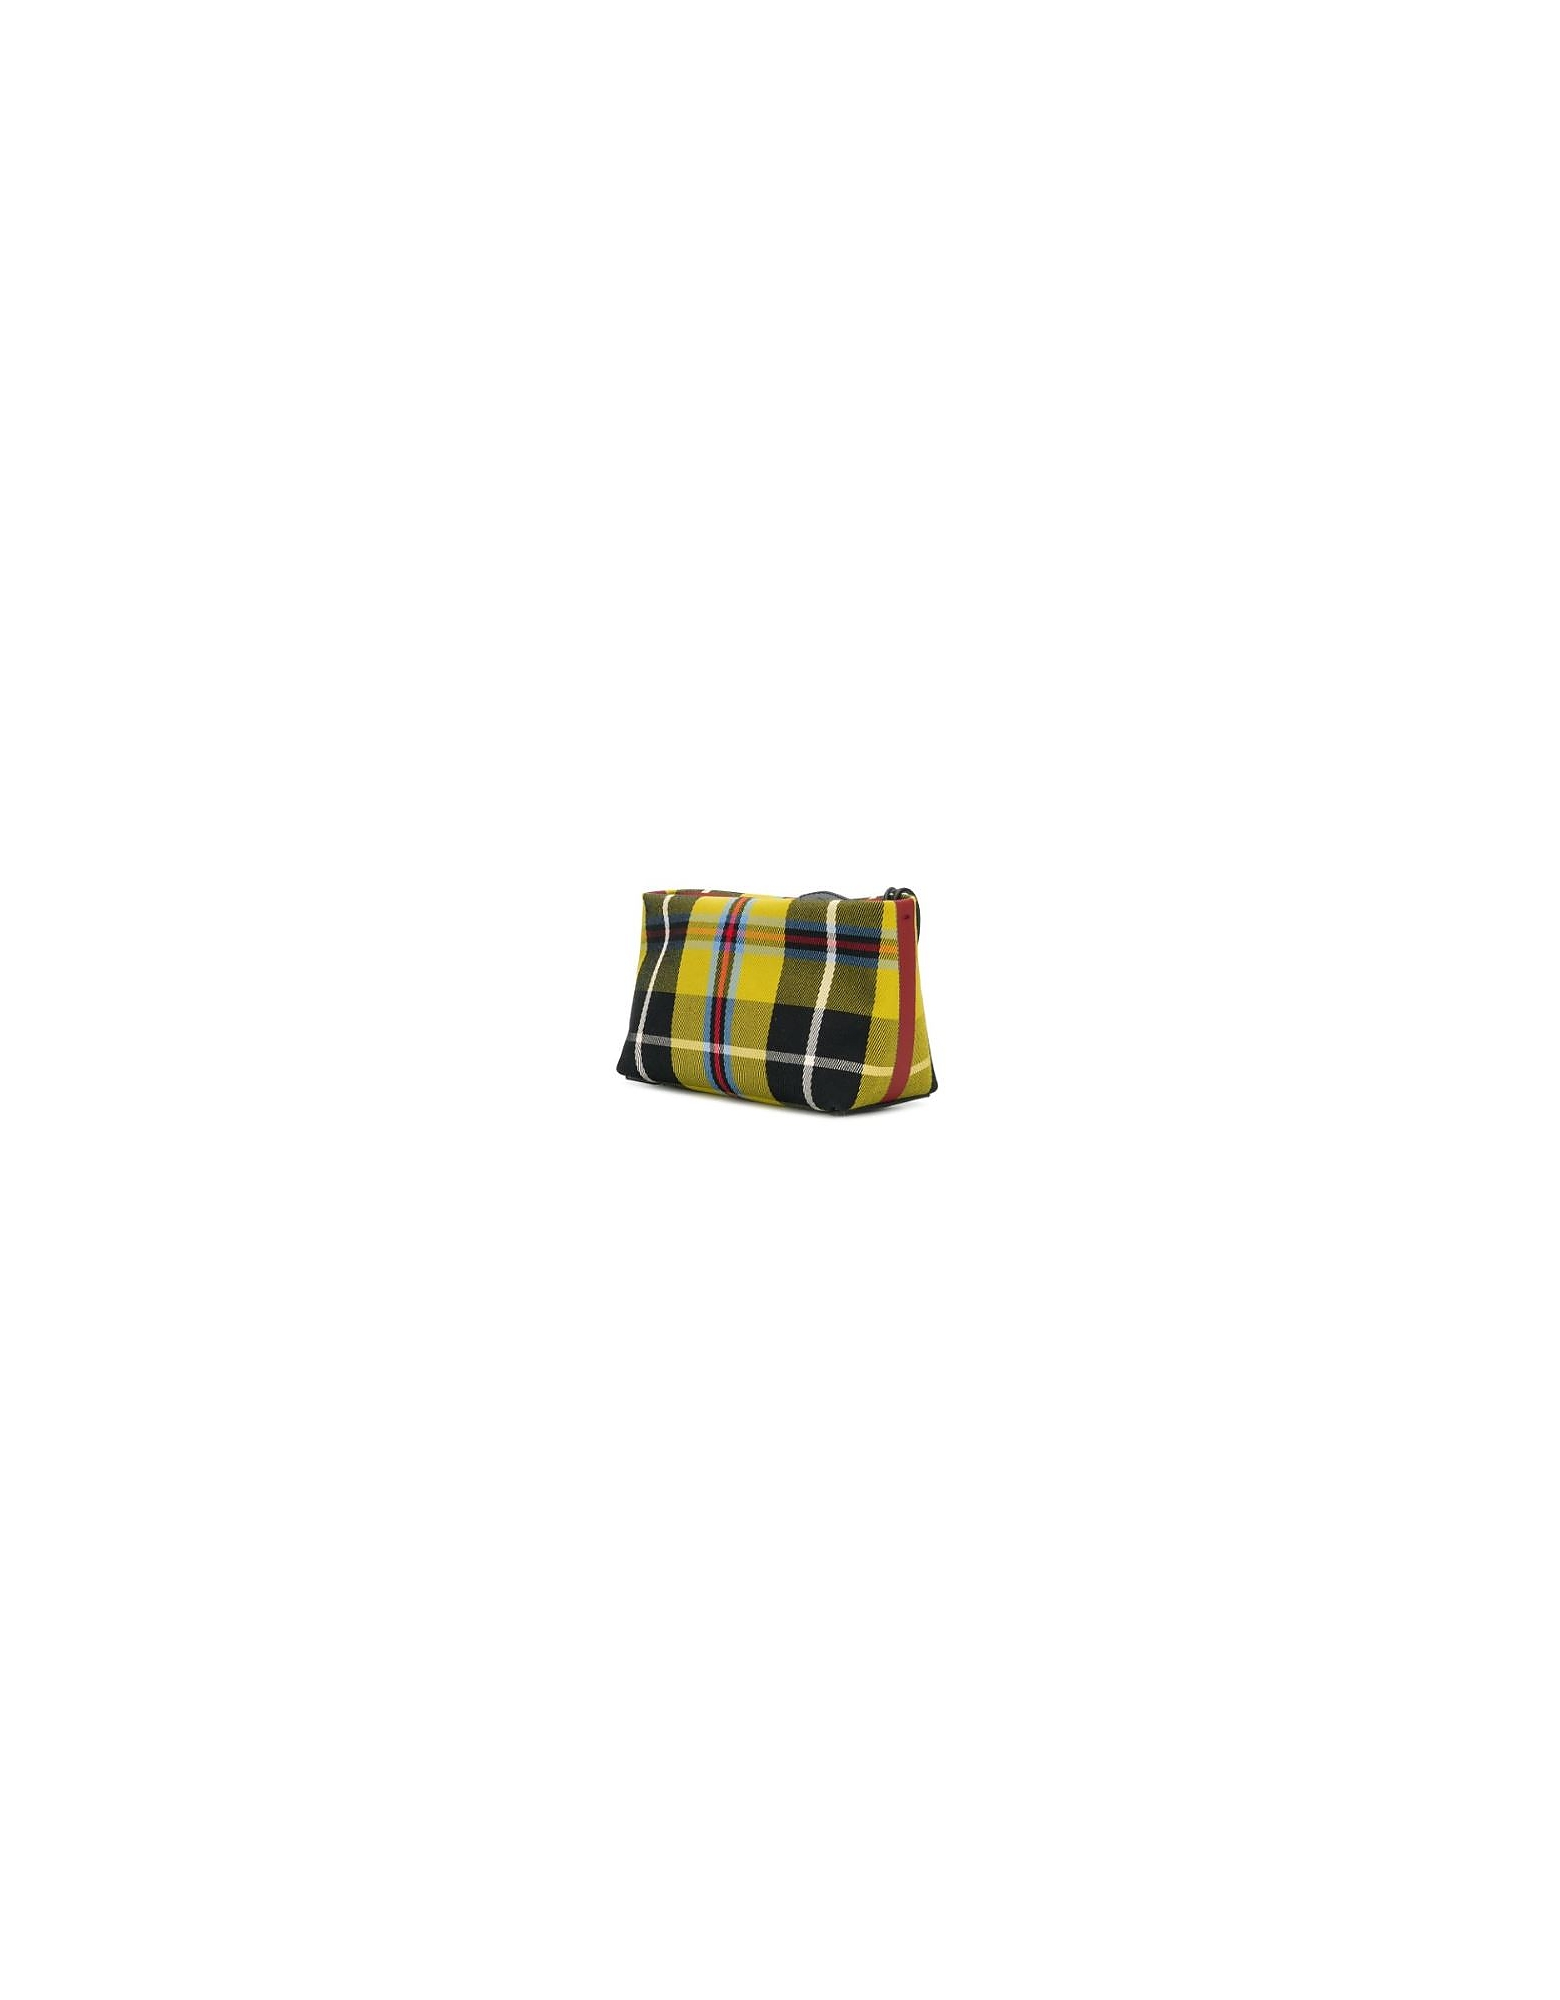 Burberry Designer Handbags, Yellow Tartan Fabric and Leather Clutch